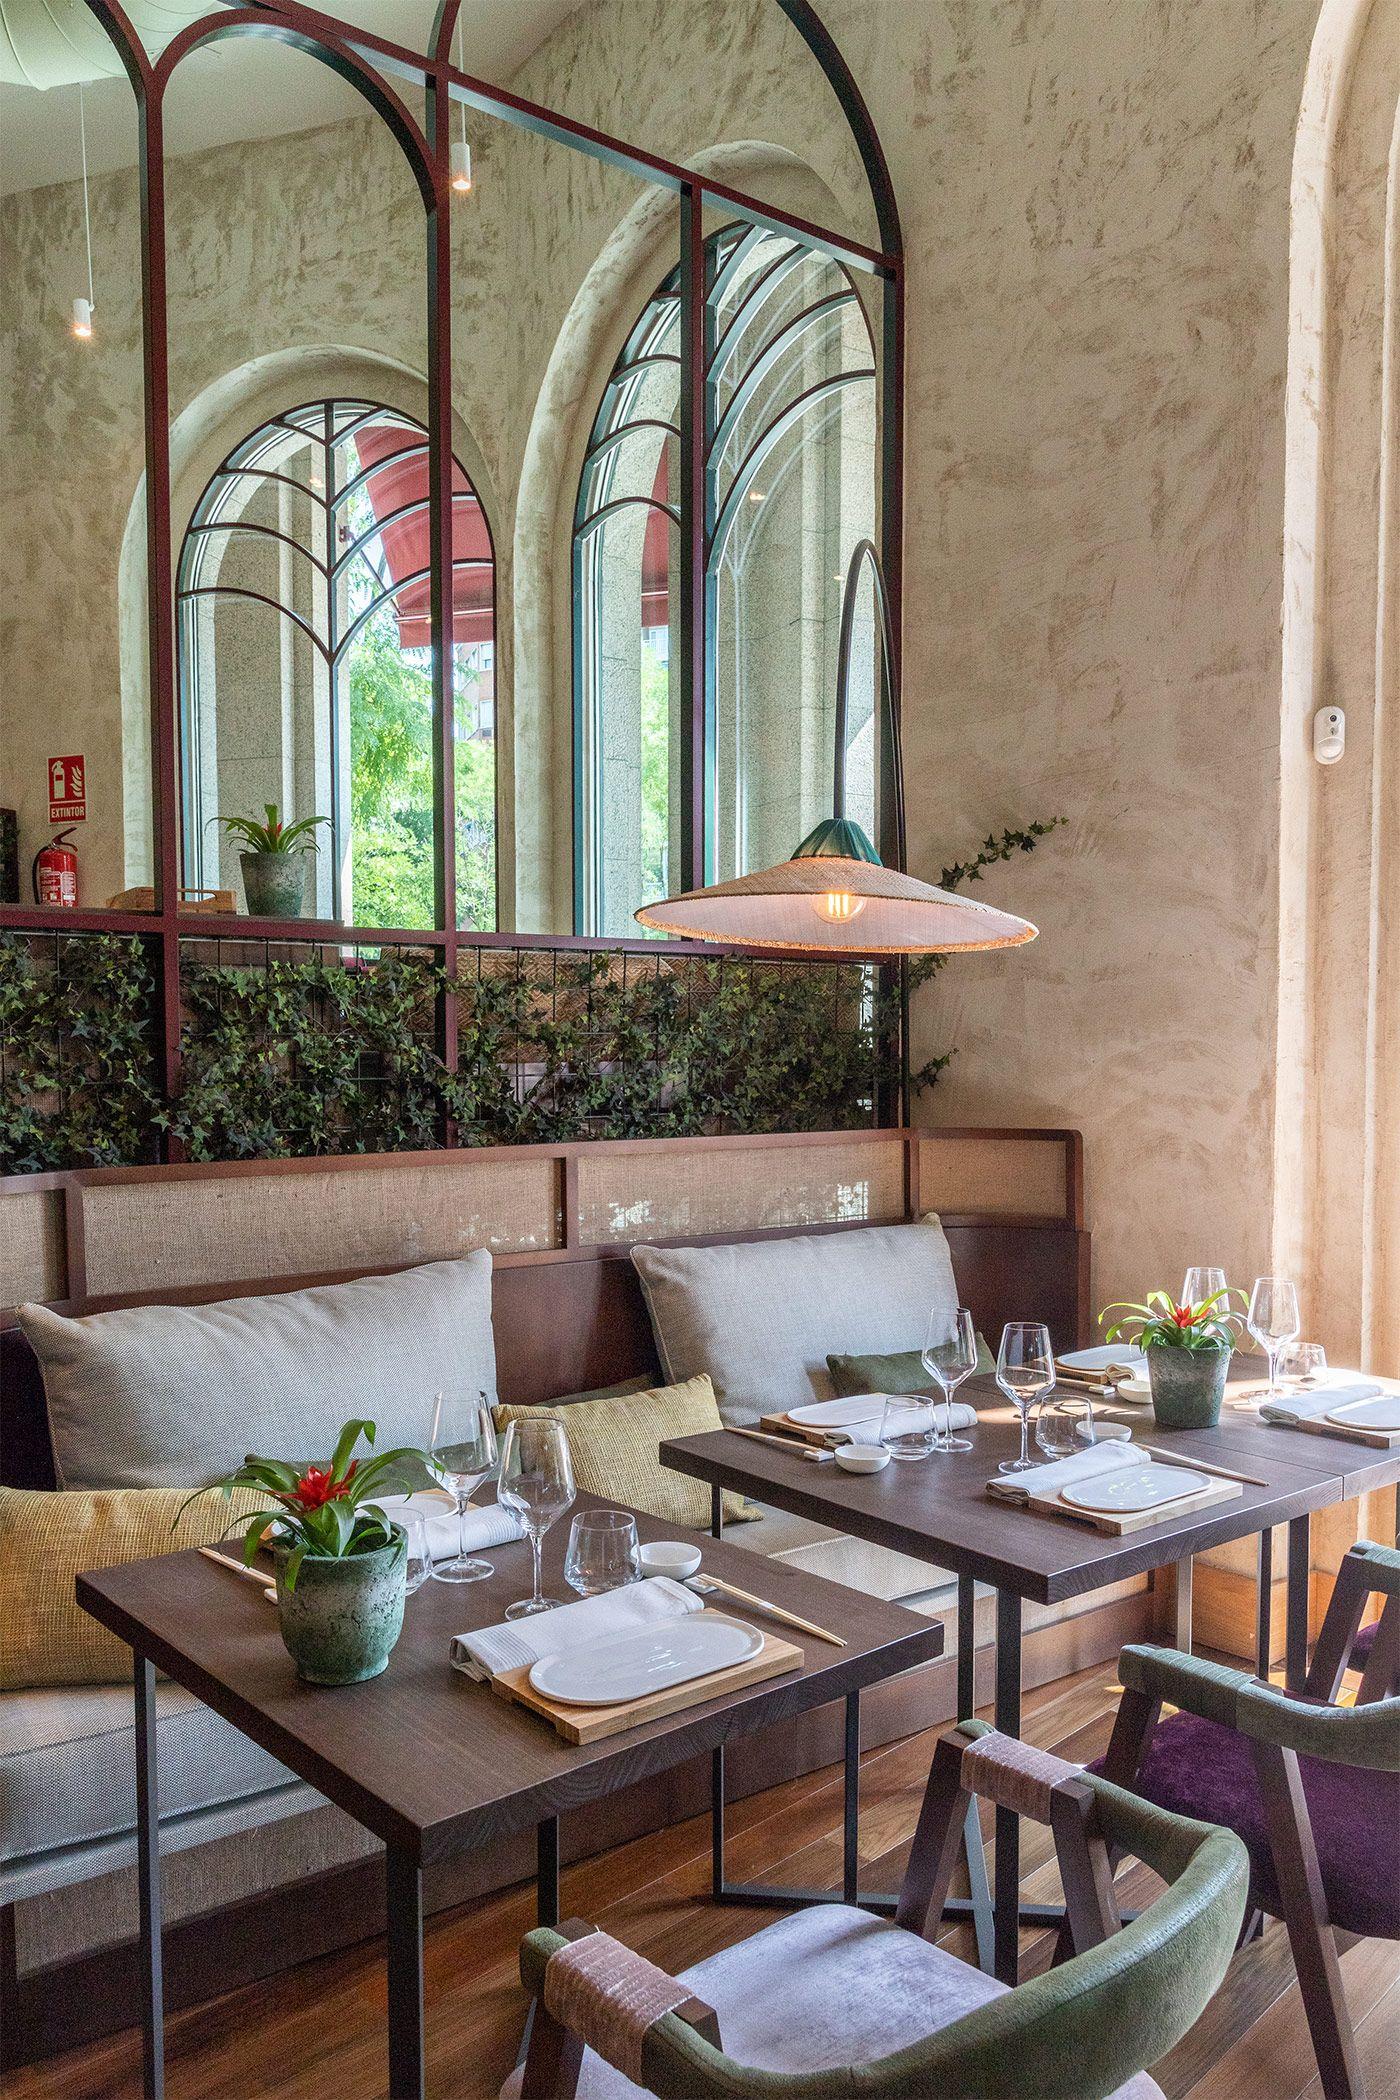 restaurantes, restaurantes de moda, restaurantes rentreé, restaurantes madrid, restaurantes barcelona, restaurantes nuevos, aperturas gastronómicas